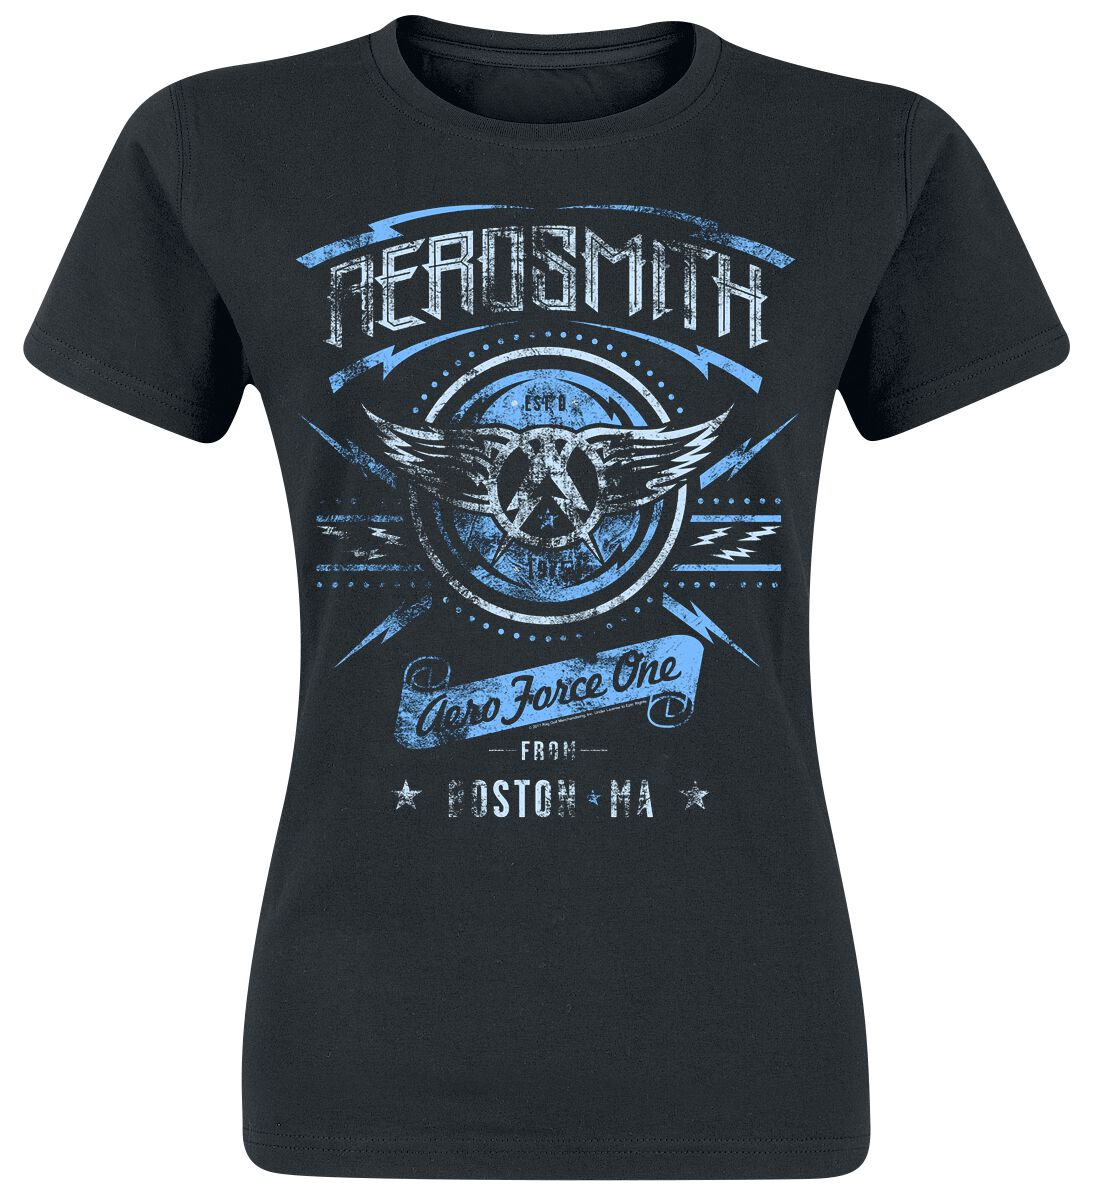 Zespoły - Koszulki - Koszulka damska Aerosmith Aero Force One Koszulka damska czarny - 358428